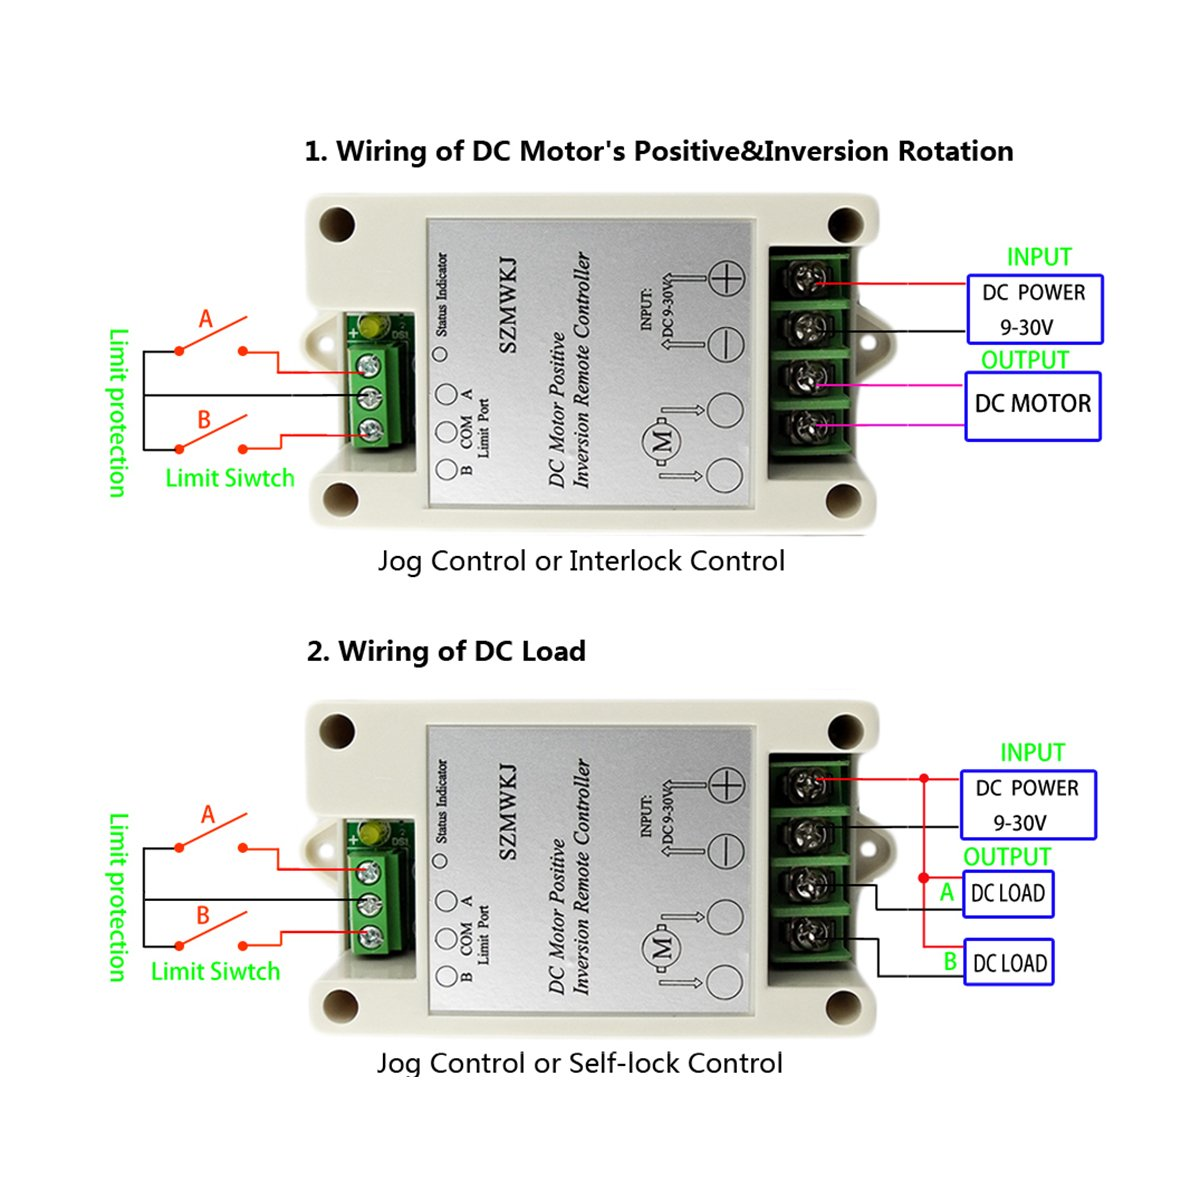 Op Amp Circuit Remote Control Diagram Symbols Dualliquidlevelsensorcircuitdiagramjpg Amazon Com Szmwkj Wireless Motor Controller Rh Circuits Tutorial